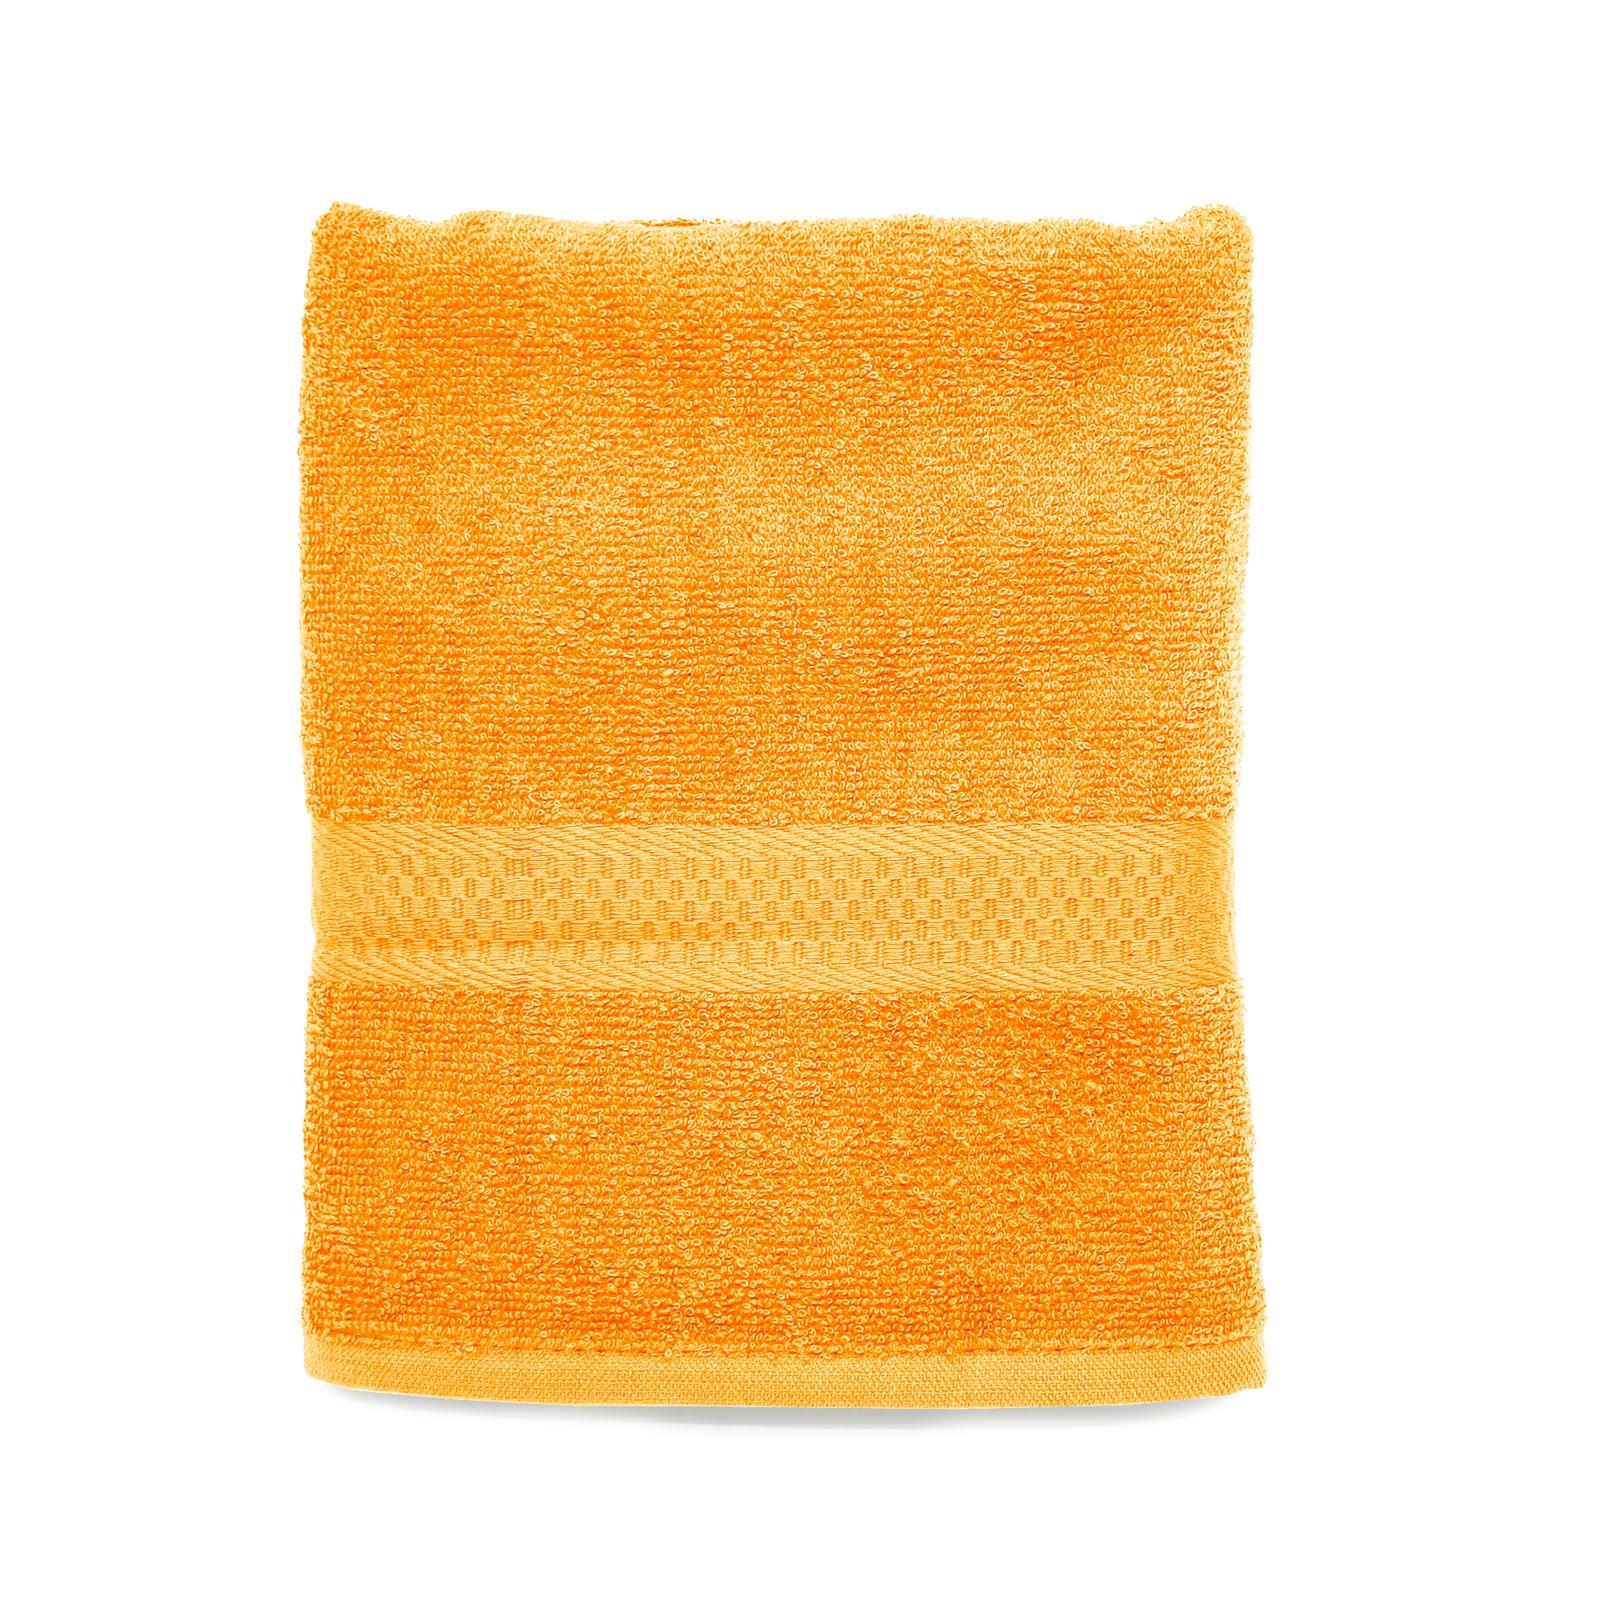 Полотенце банное Spany, 21311318181, махровое, оранжевый, 50 х 90 см полотенце банное fiesta arabesca 50 90 см